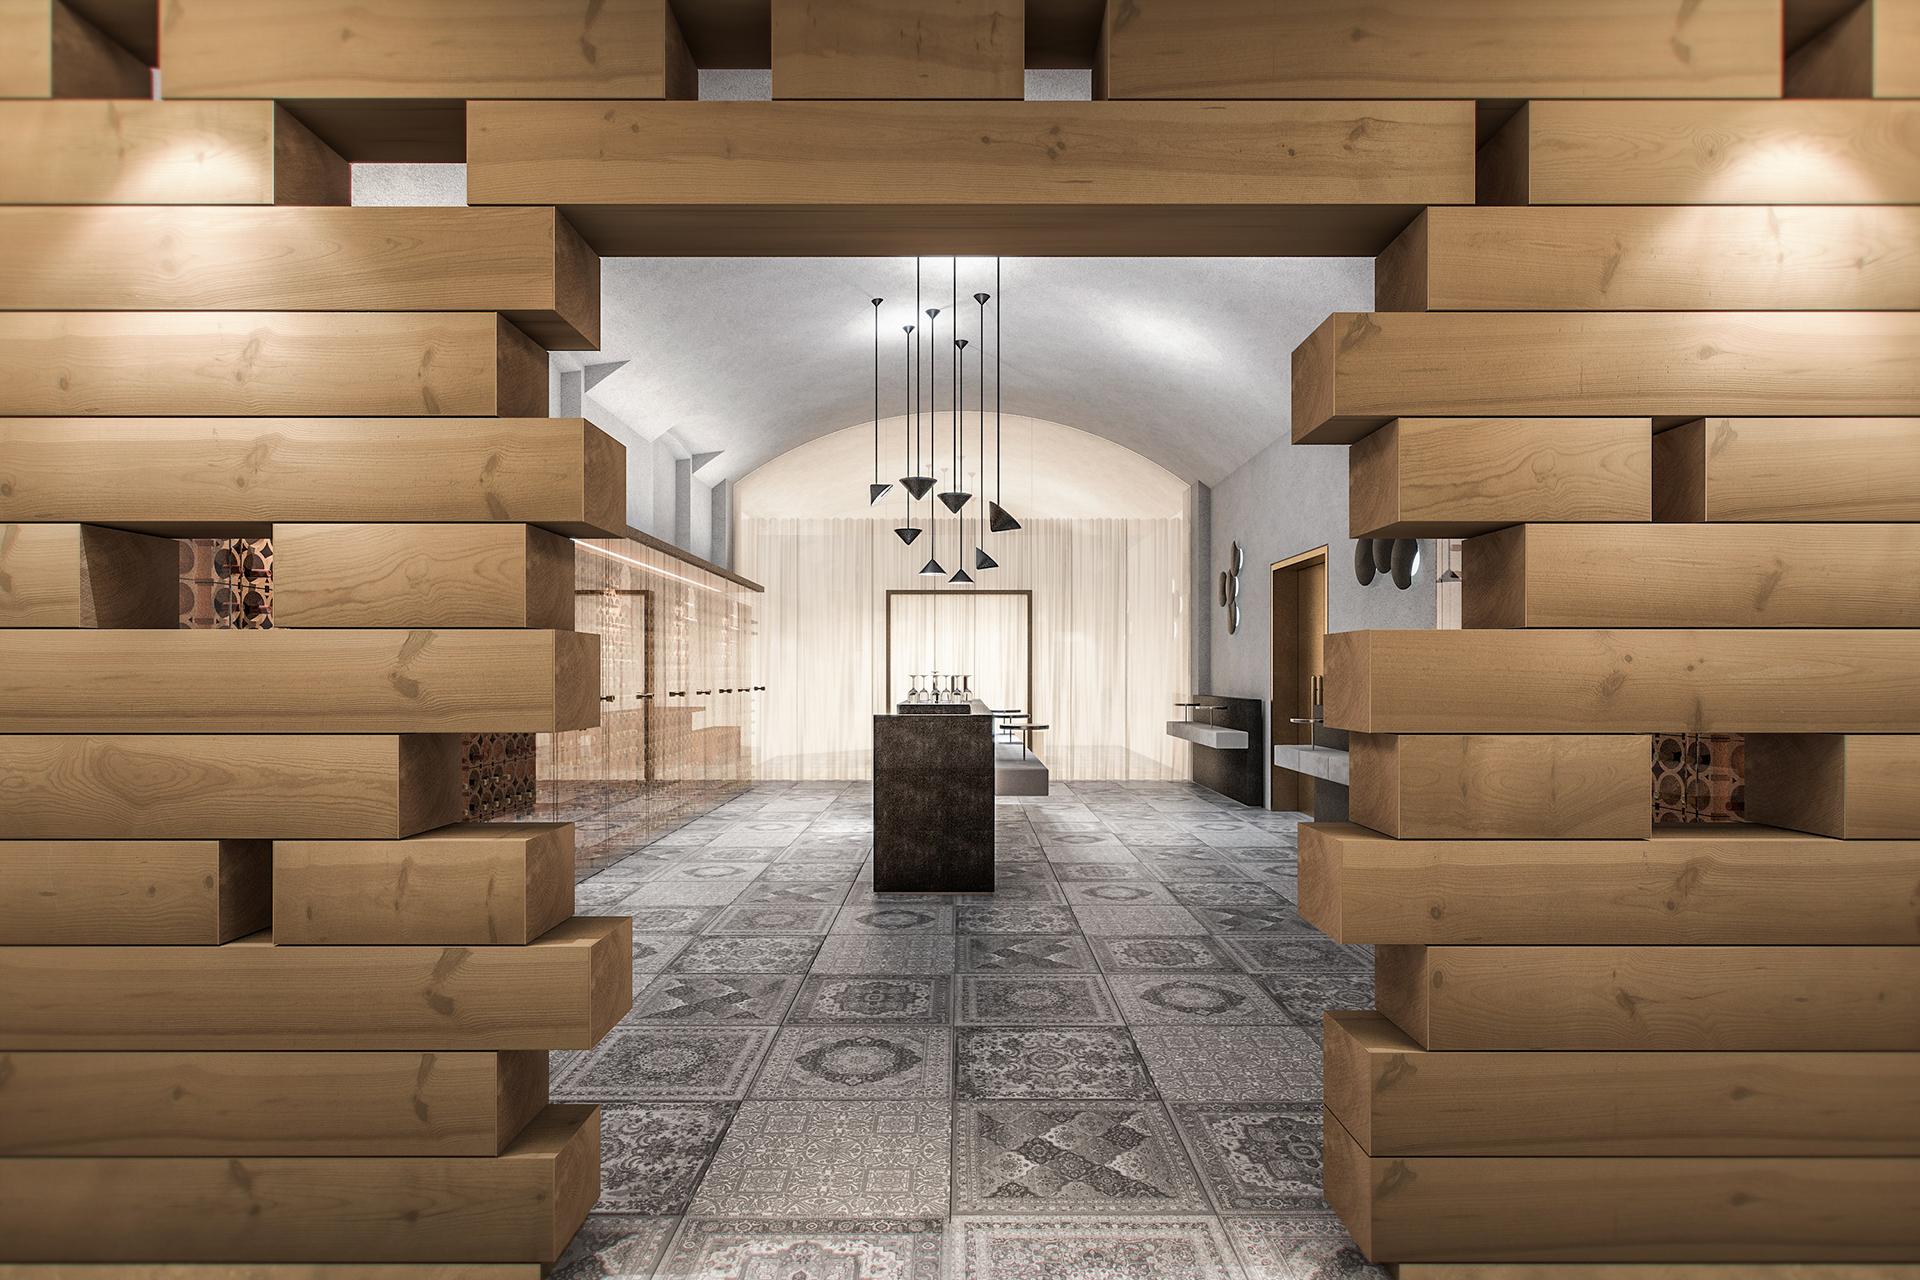 herzfeldhaus, austria, luxury lifestyle, awards, helen siwak, real estate, history, ecoluxluv, folioyvr, vancouver, bc, vancity, yvr